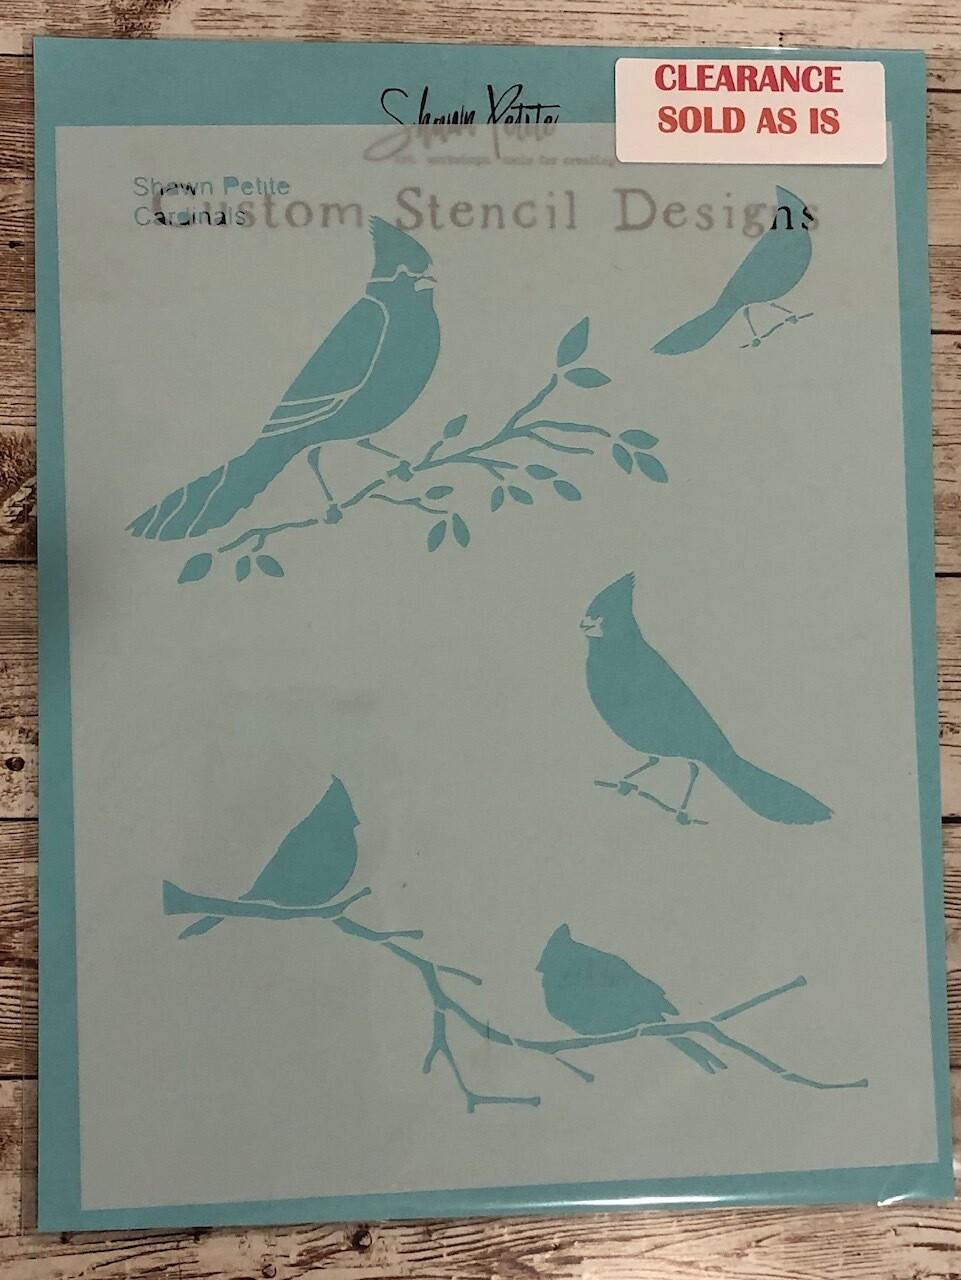 Cardinals stencil clearance